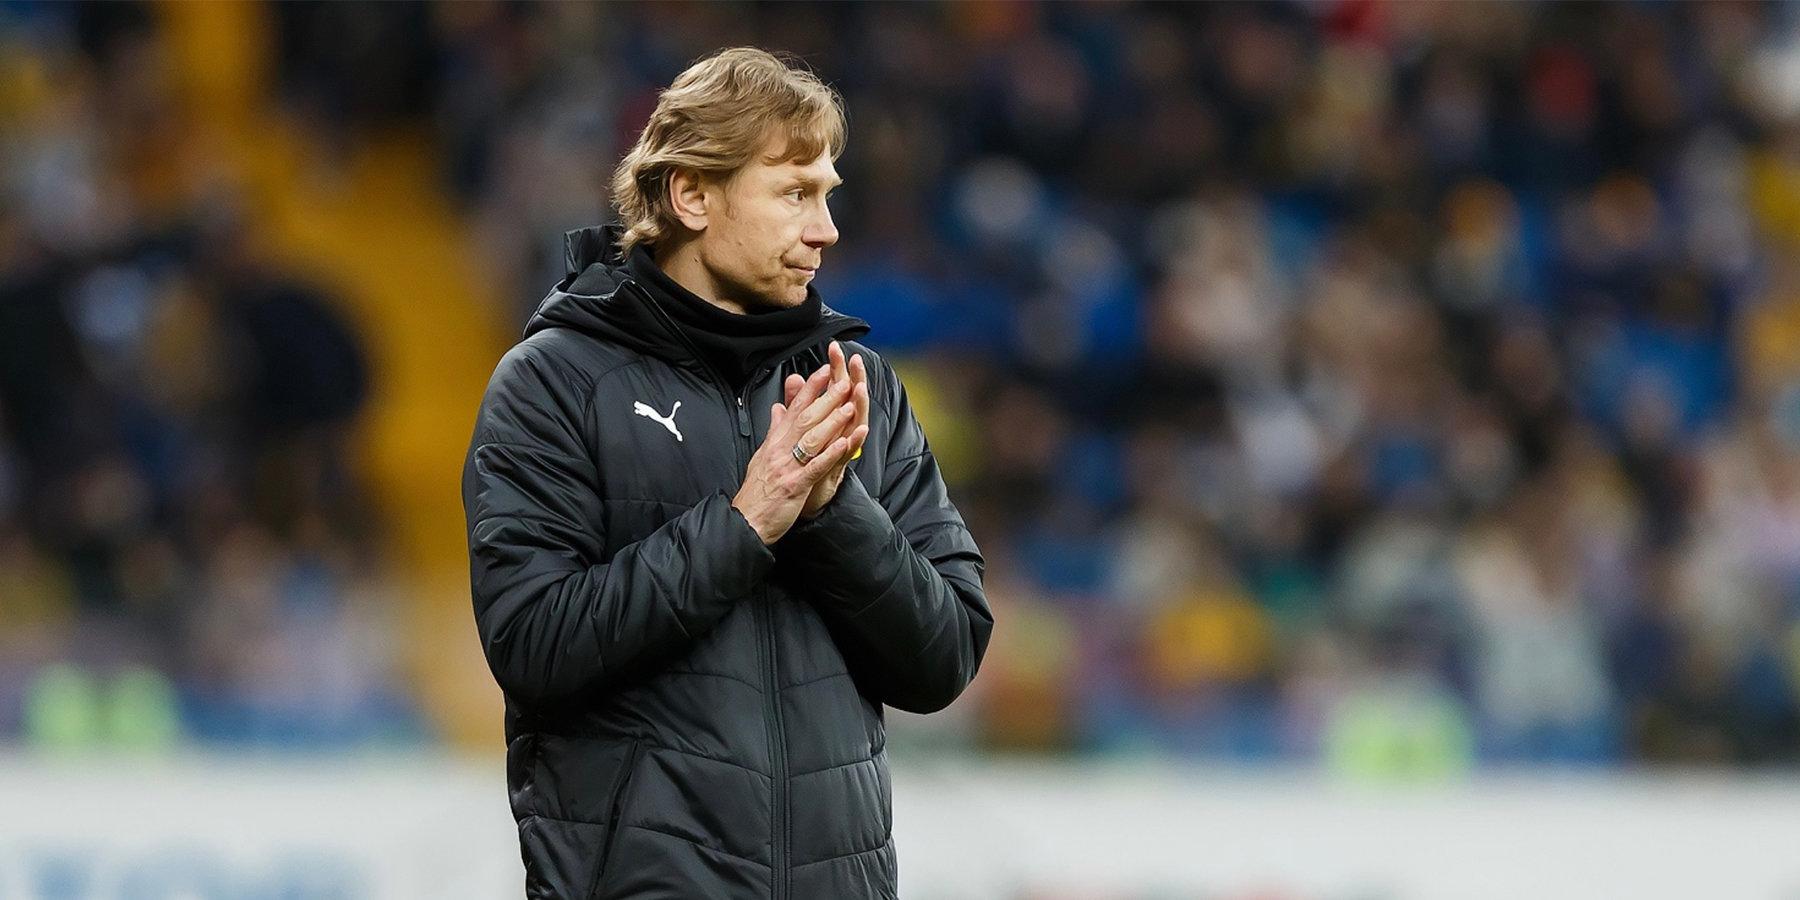 Валерий Карпин: «Норманн вряд ли сыграет до конца сезона»